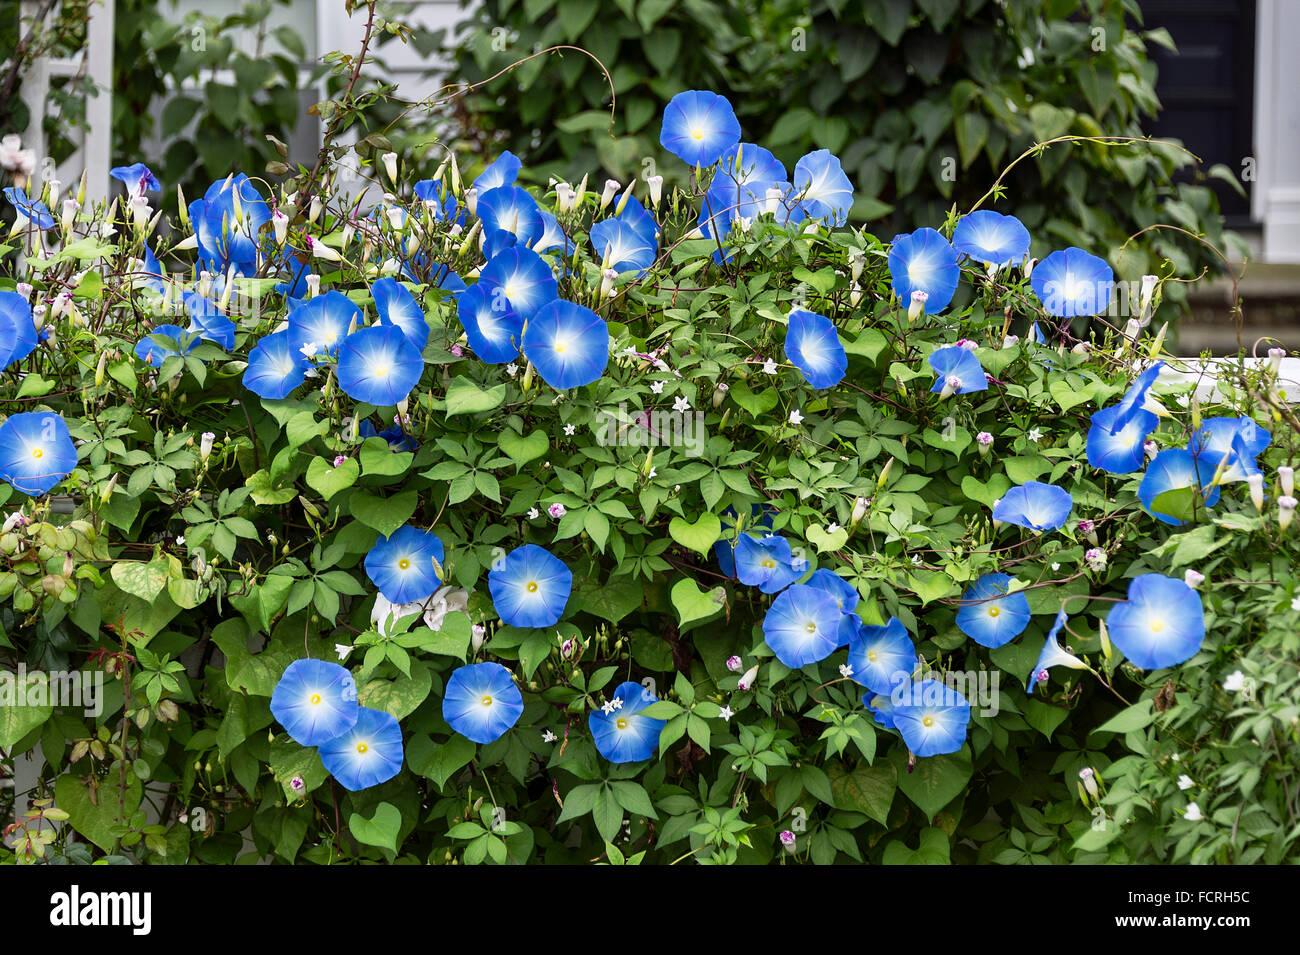 Morning Glory in full bloom. - Stock Image